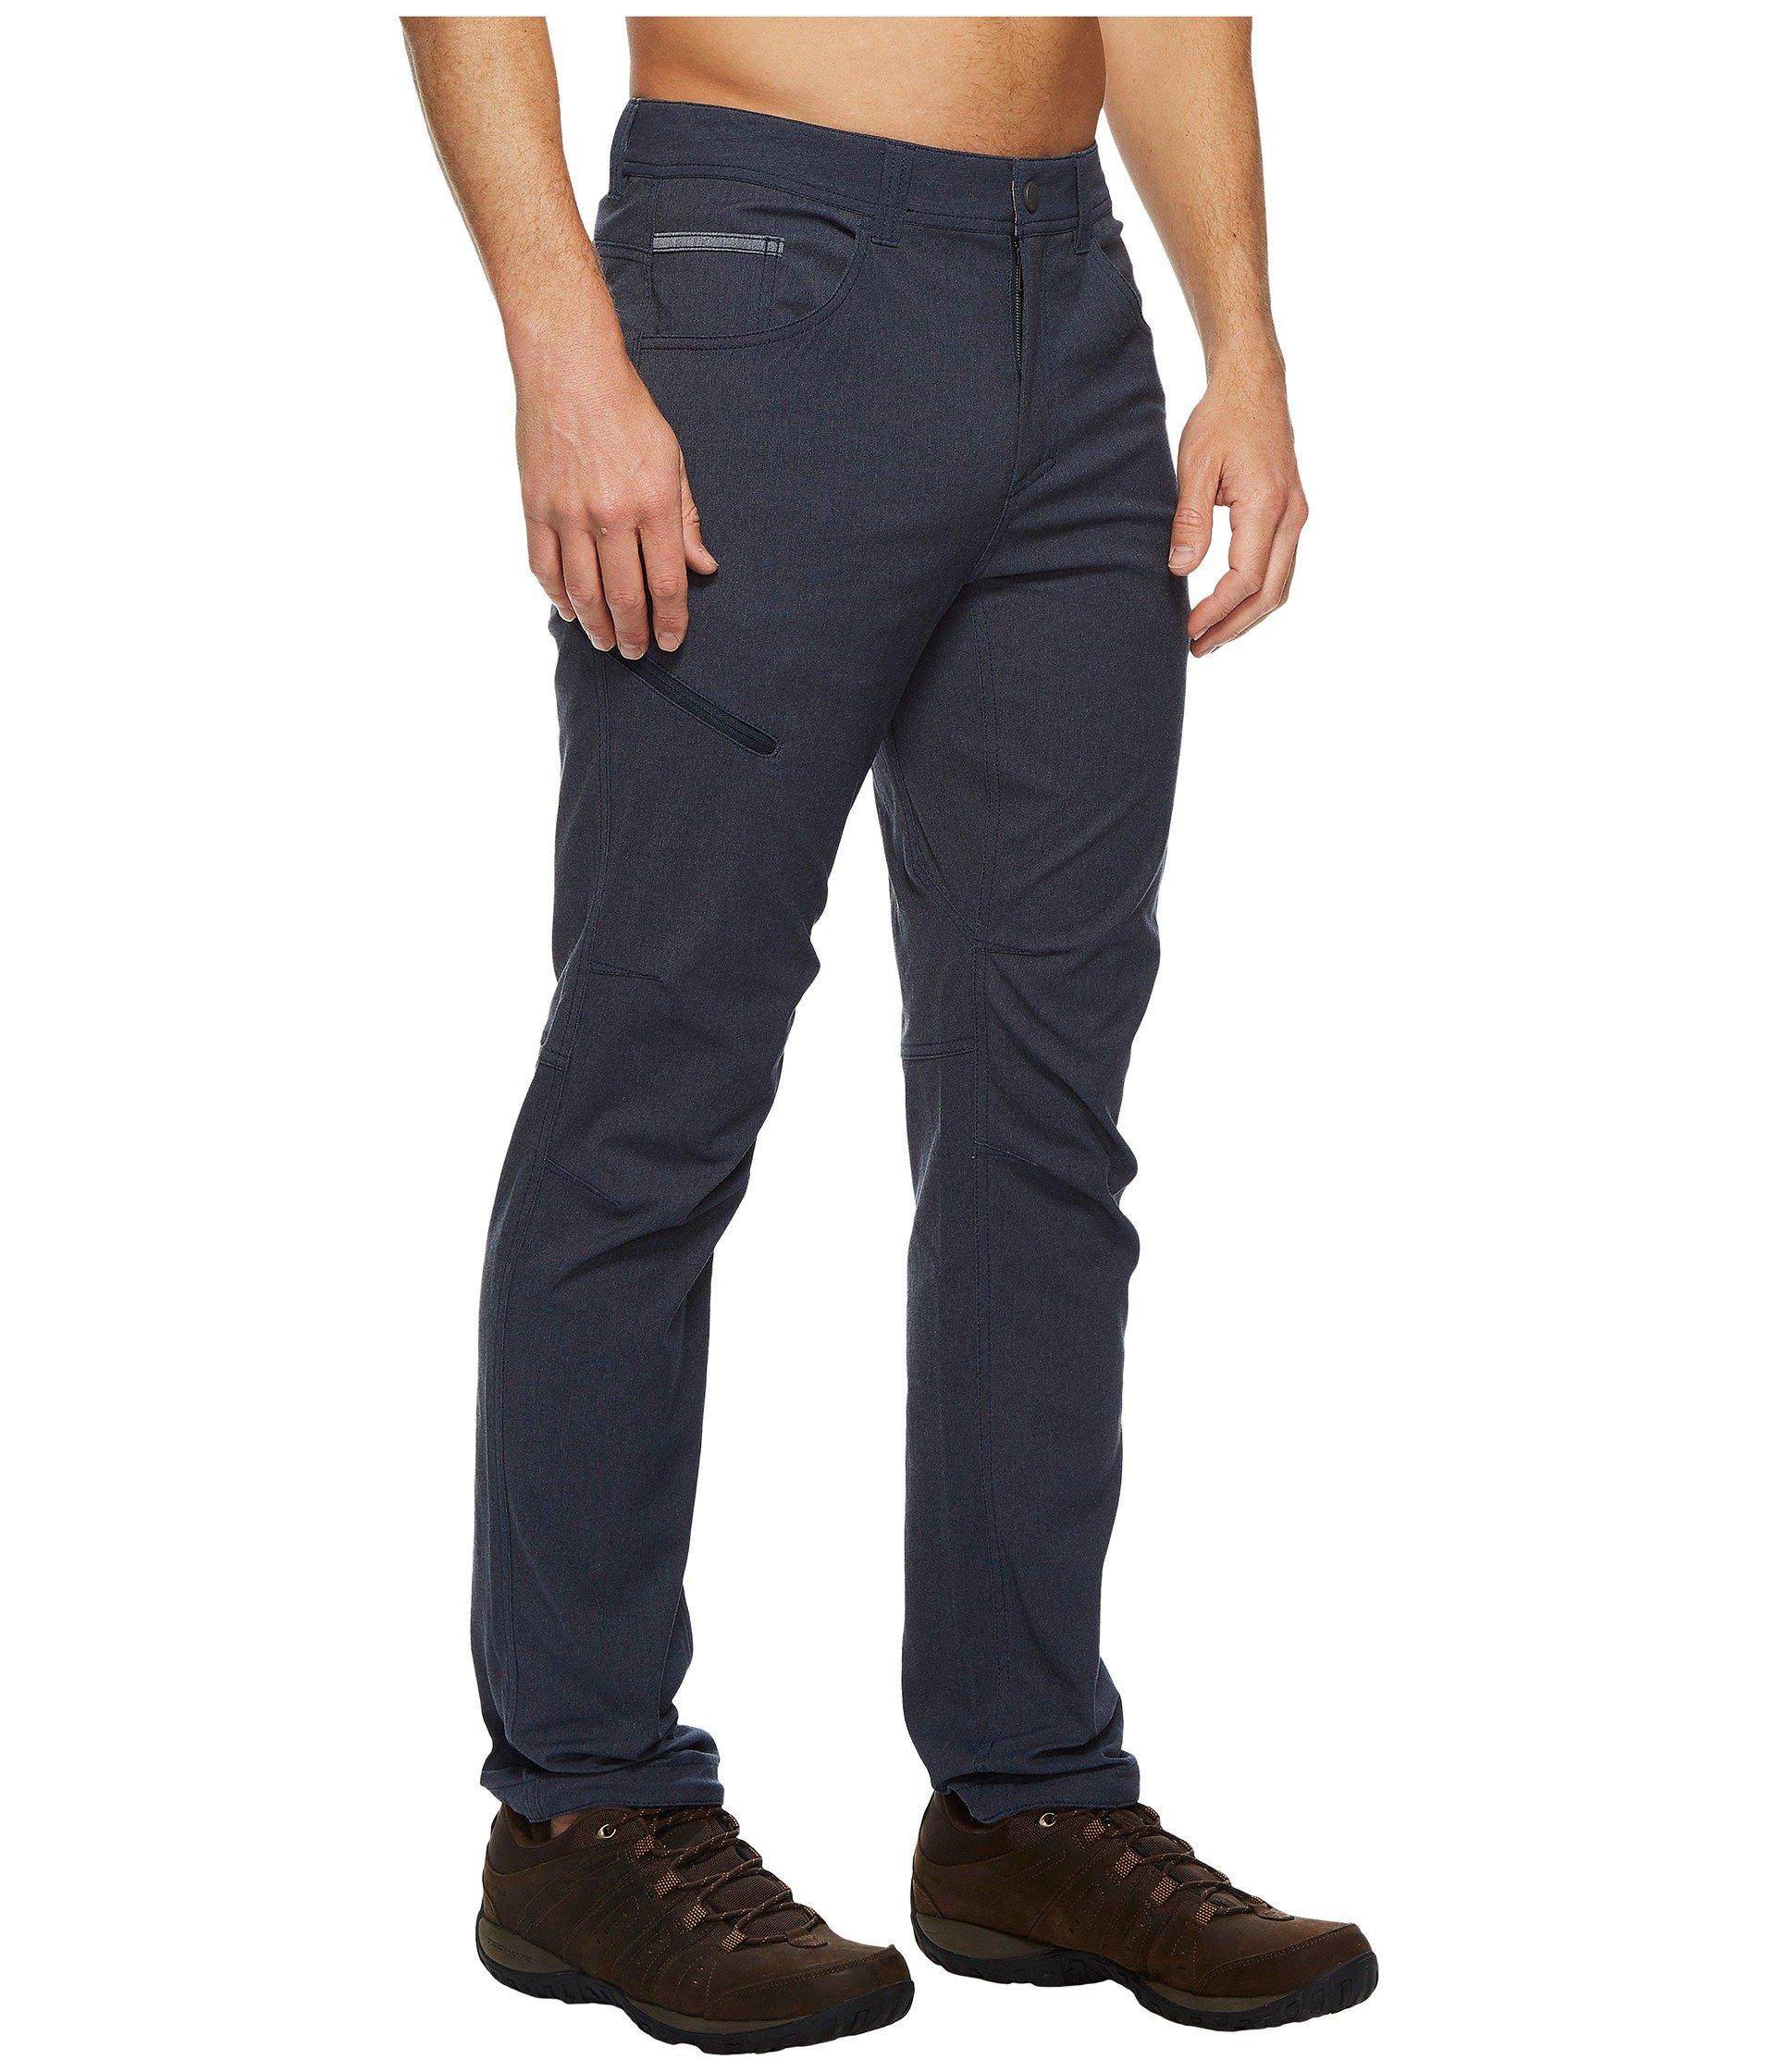 Pants Blue Robbins Royal Road Deep Alpine qwfAt6aTx